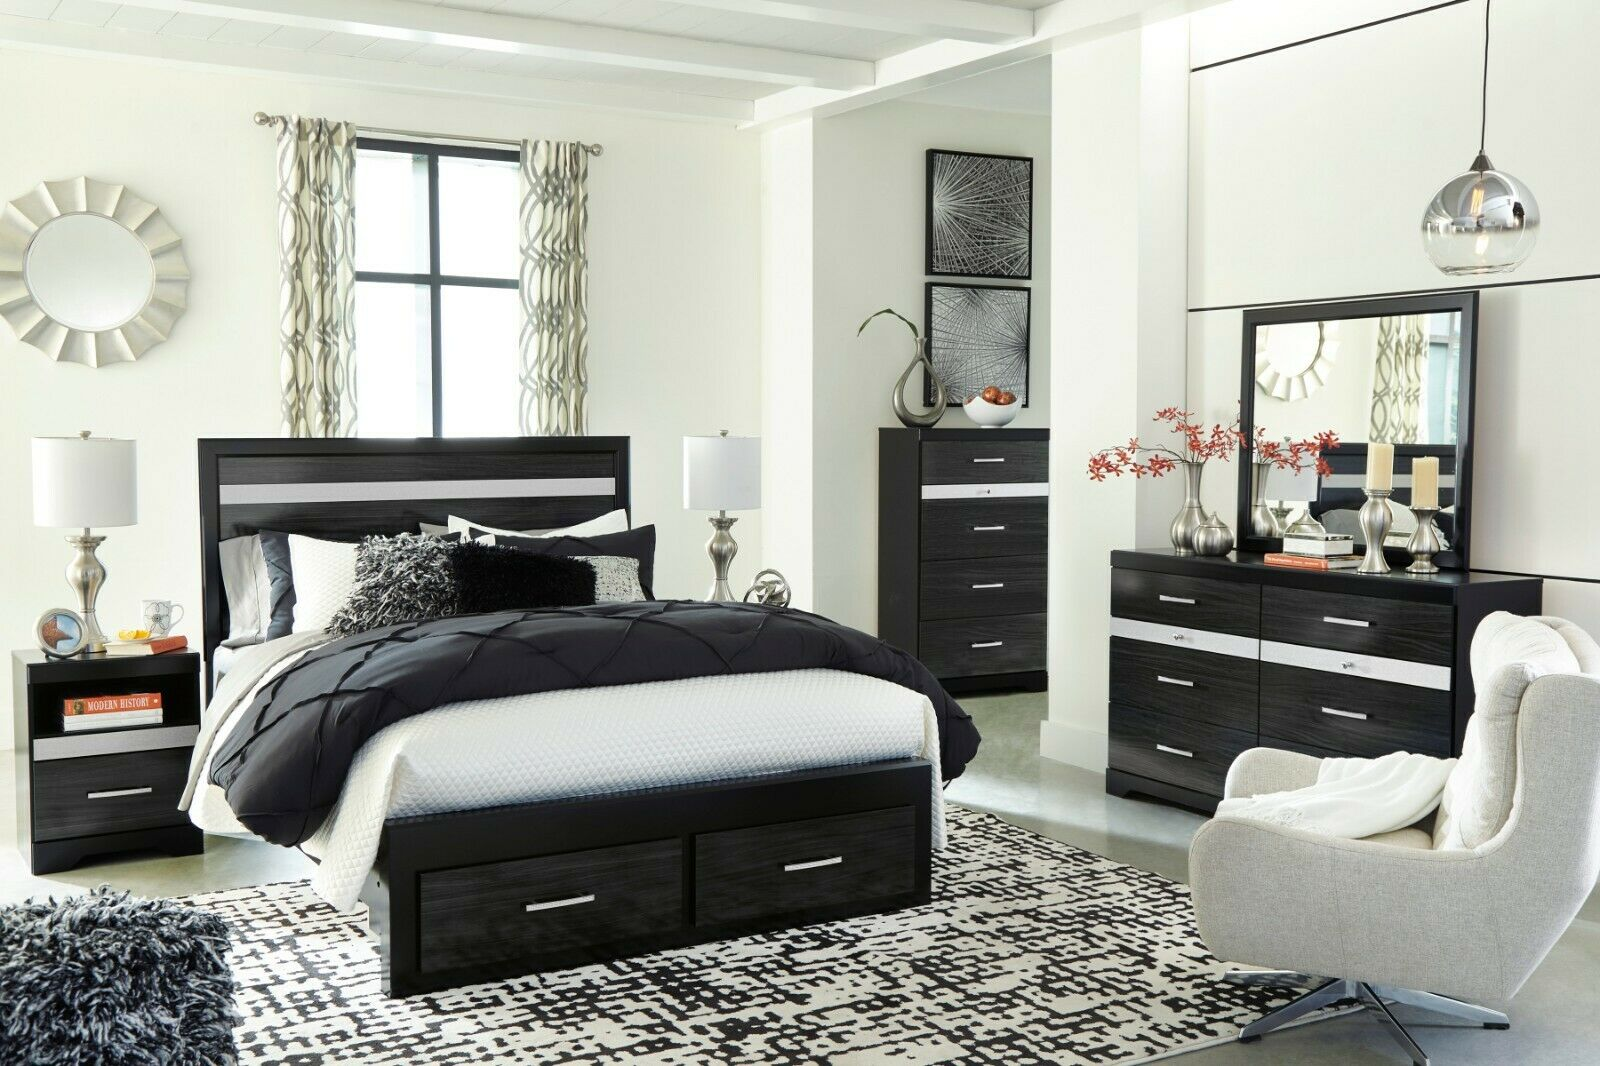 Ashley Furniture Starberry Queen Panel Storage 7 Piece Bedroom Set